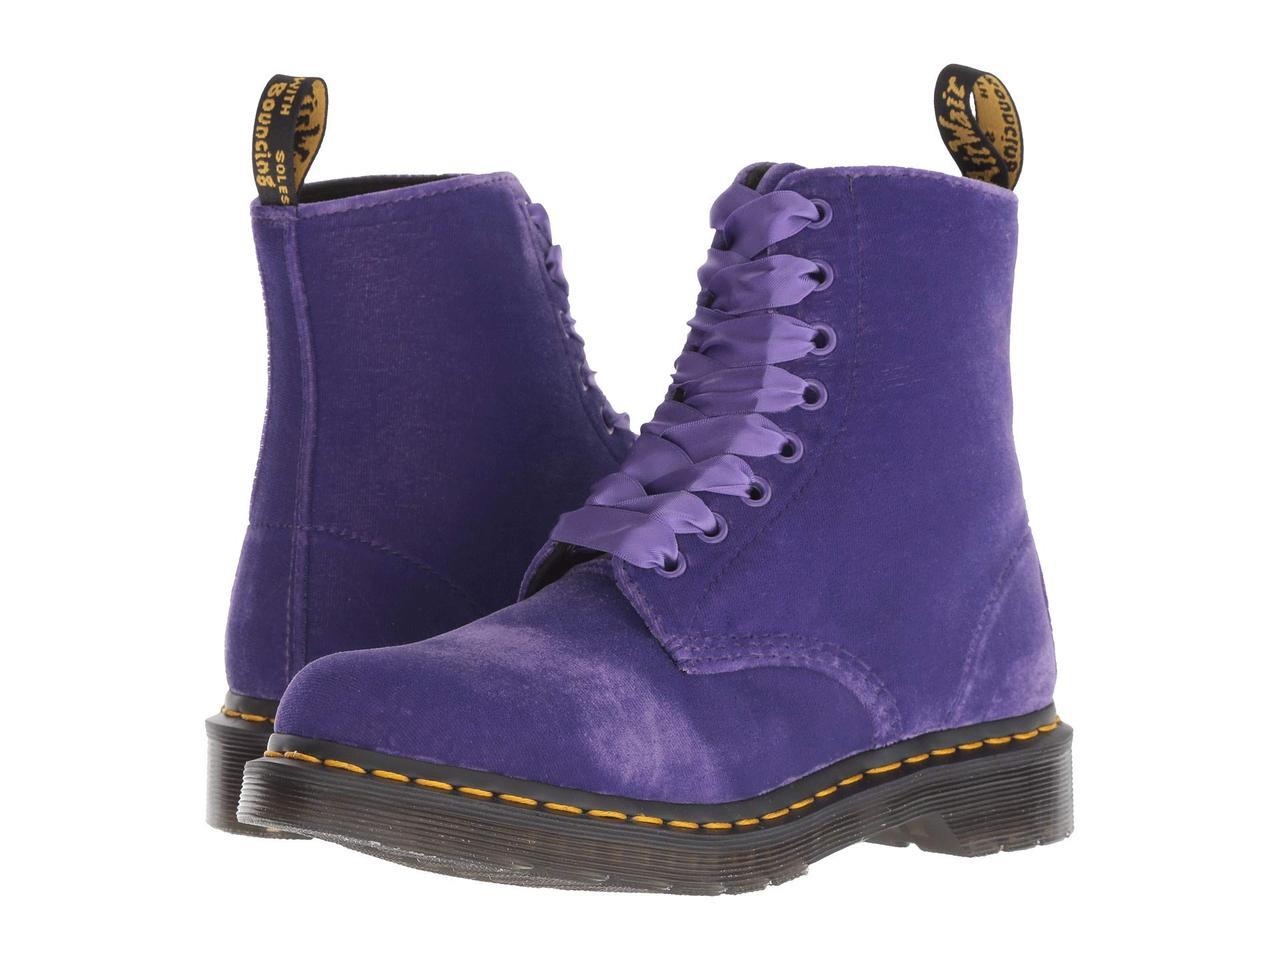 Ботинки Сапоги (Оригинал) Dr. Martens 1460 Pascal Velvet Dusty Violet Velvet 9510896aa0d74